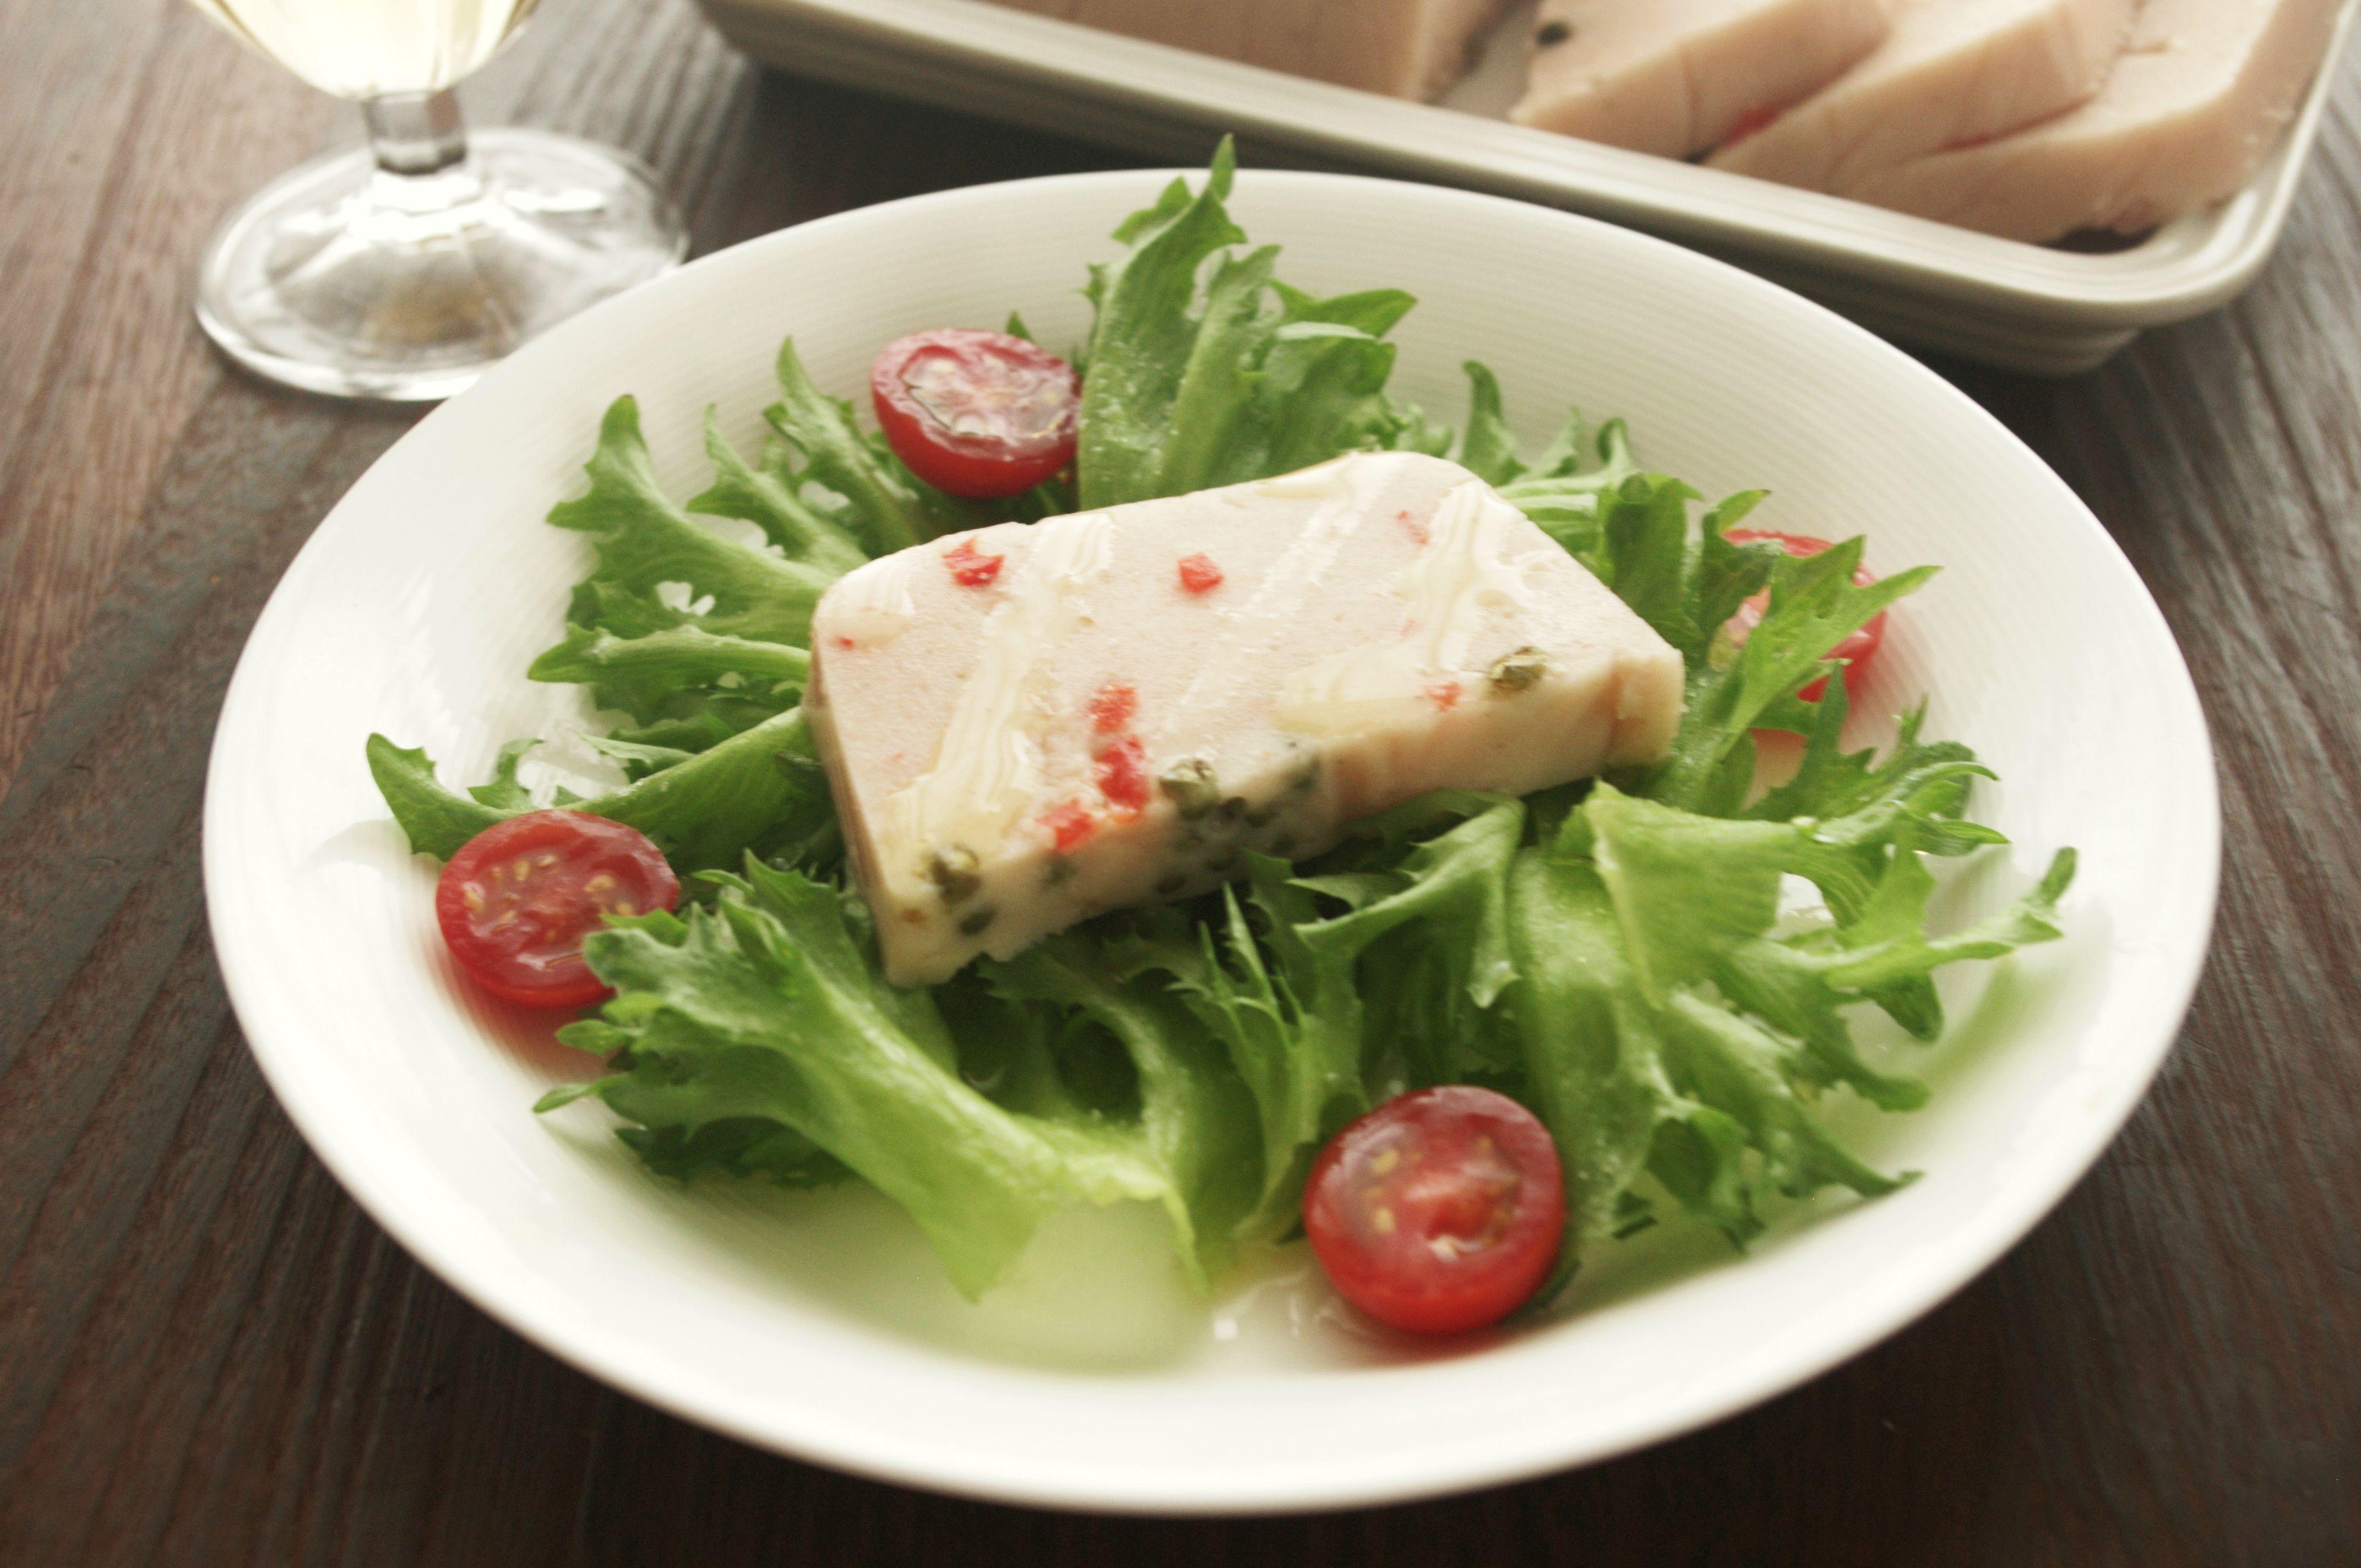 http://www.recipe-blog.jp/special/spiceblog/yummy/2016/09/13/IMGP7547.JPG